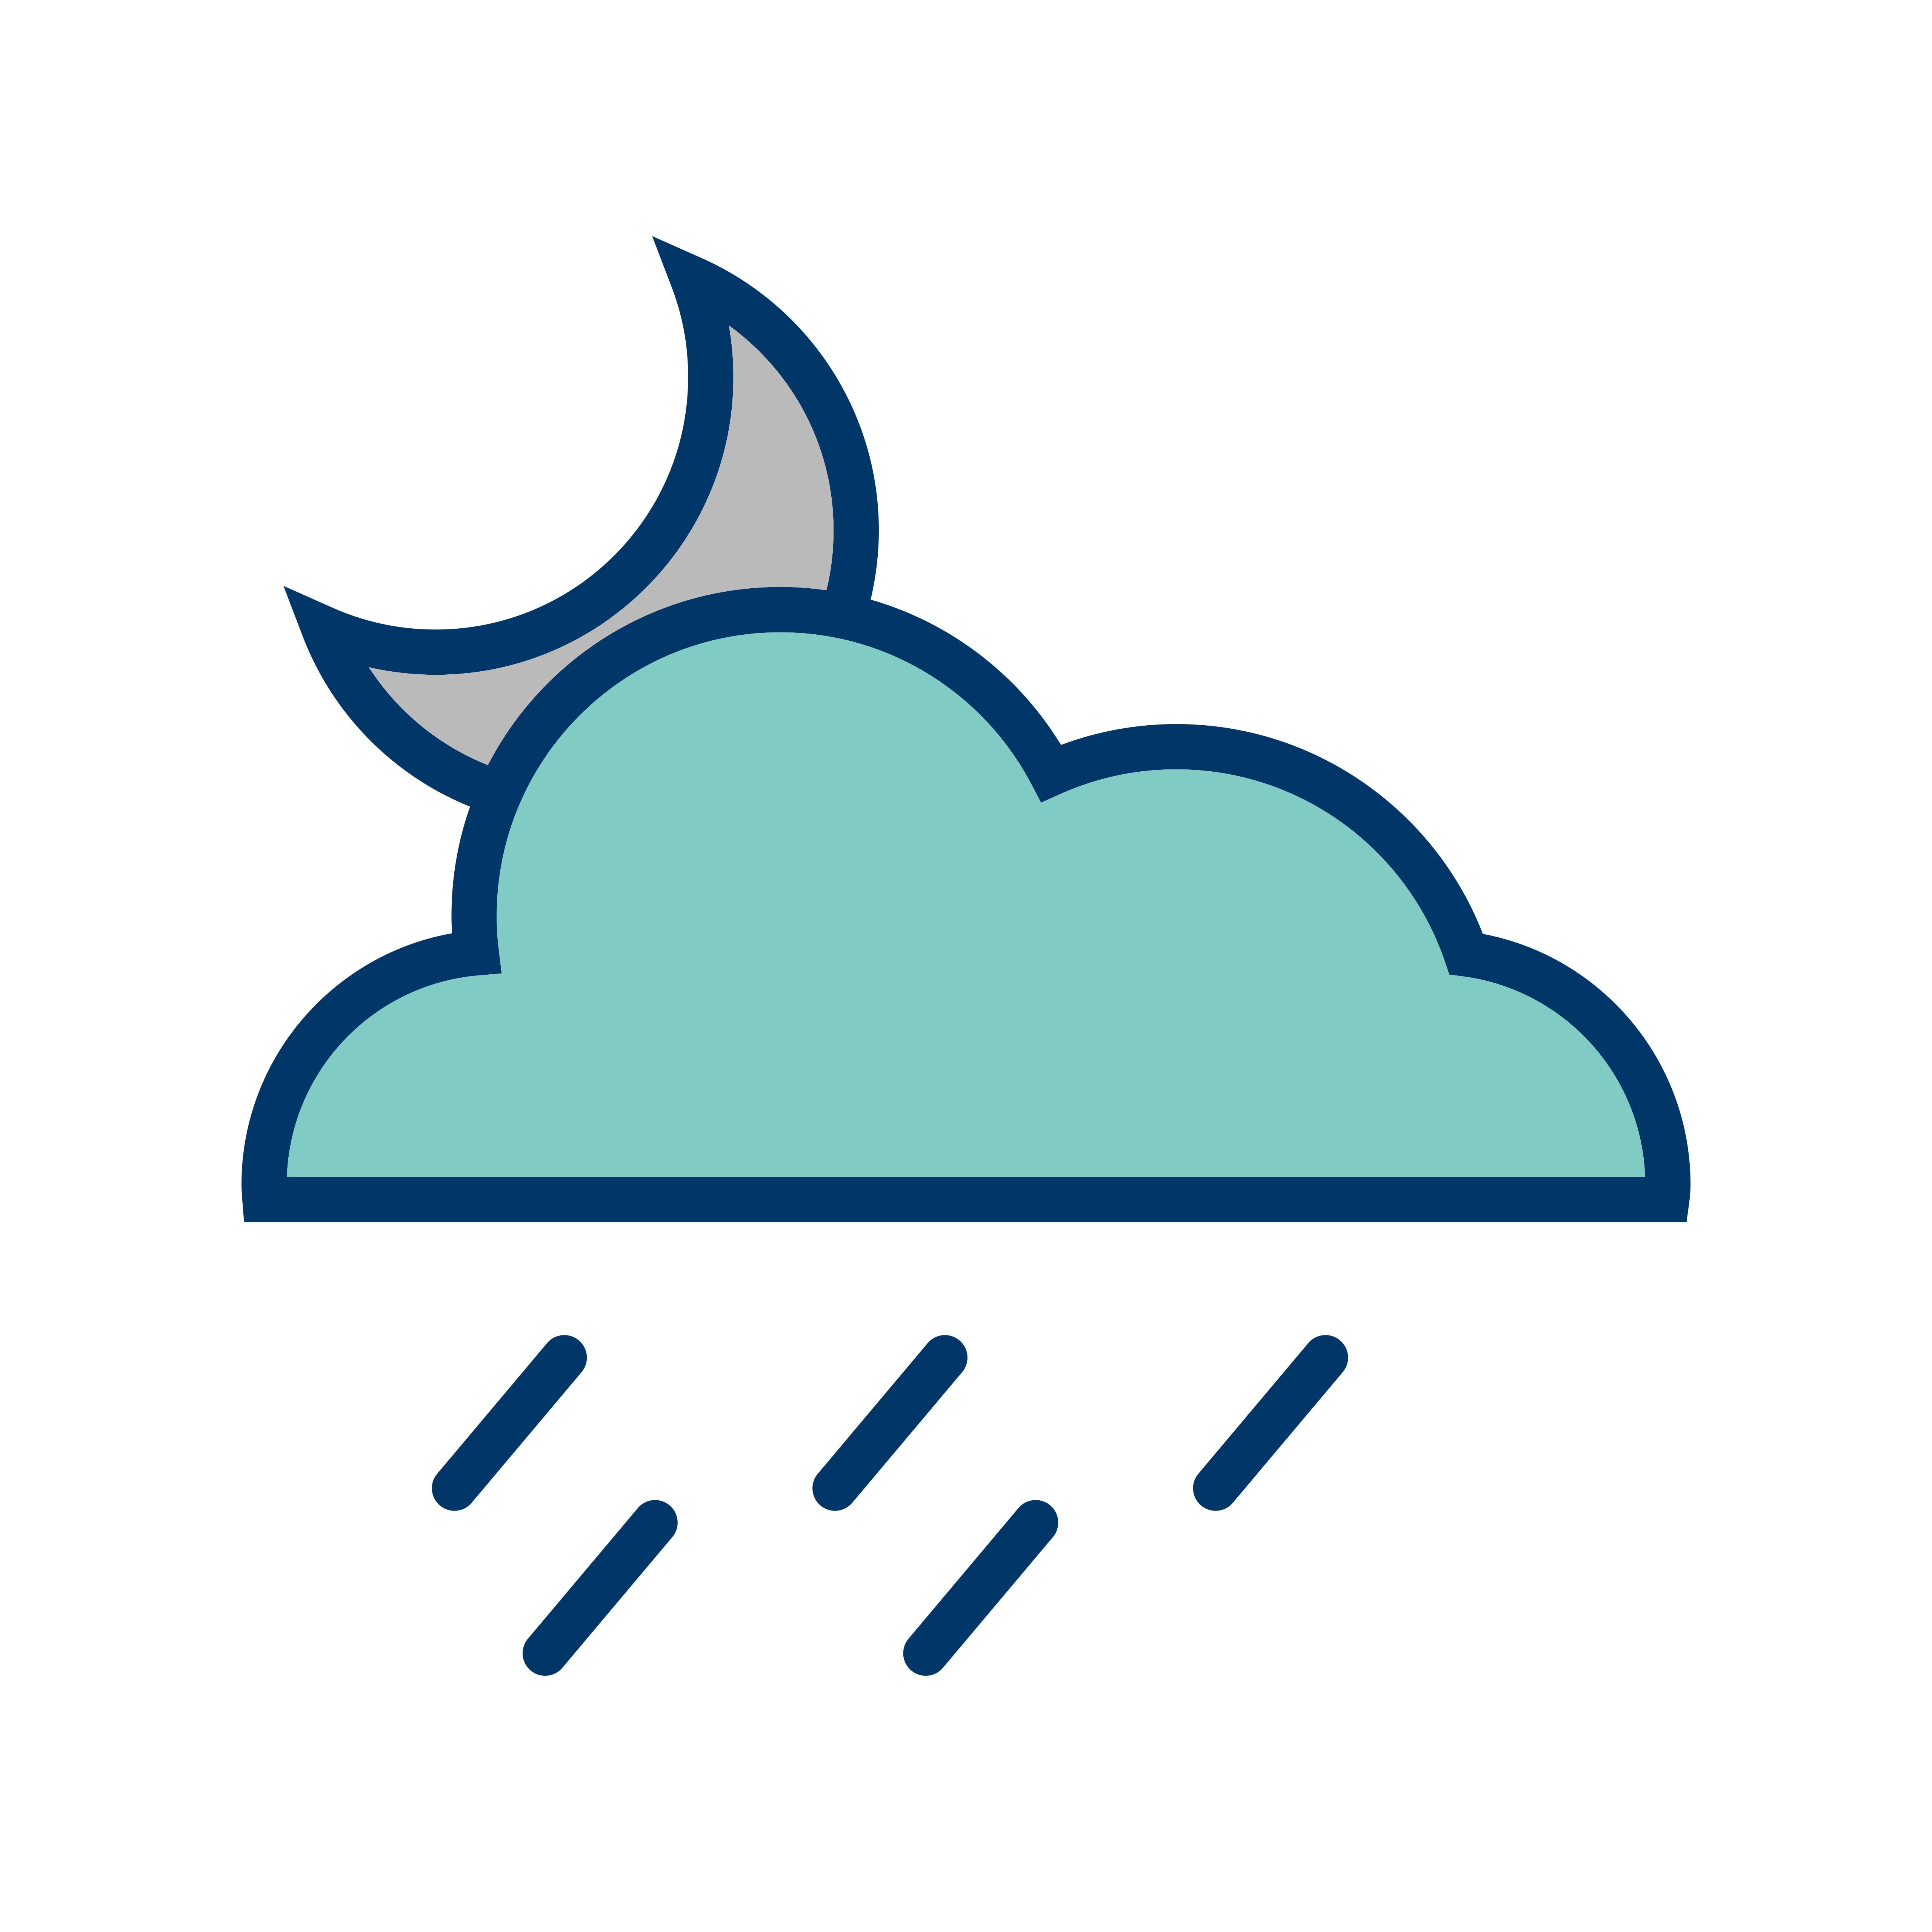 Night Rain Vector Icon - Download Free Vector Art, Stock ...